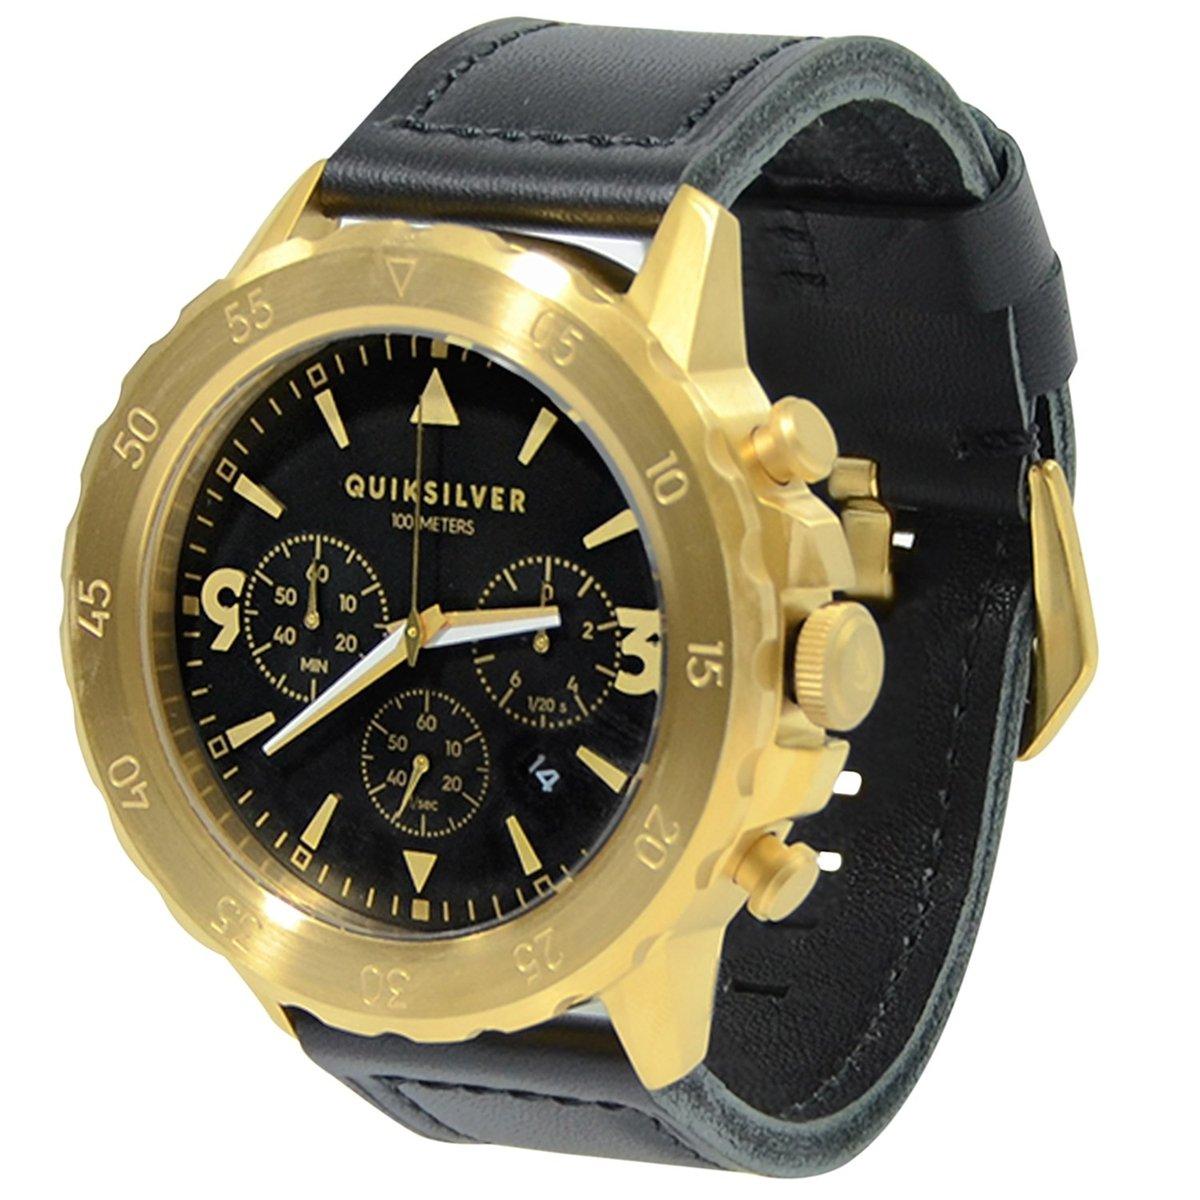 c2bbf1dfbecac Relógio Quiksilver B-52 Chrono Leather - Compre Agora   Netshoes